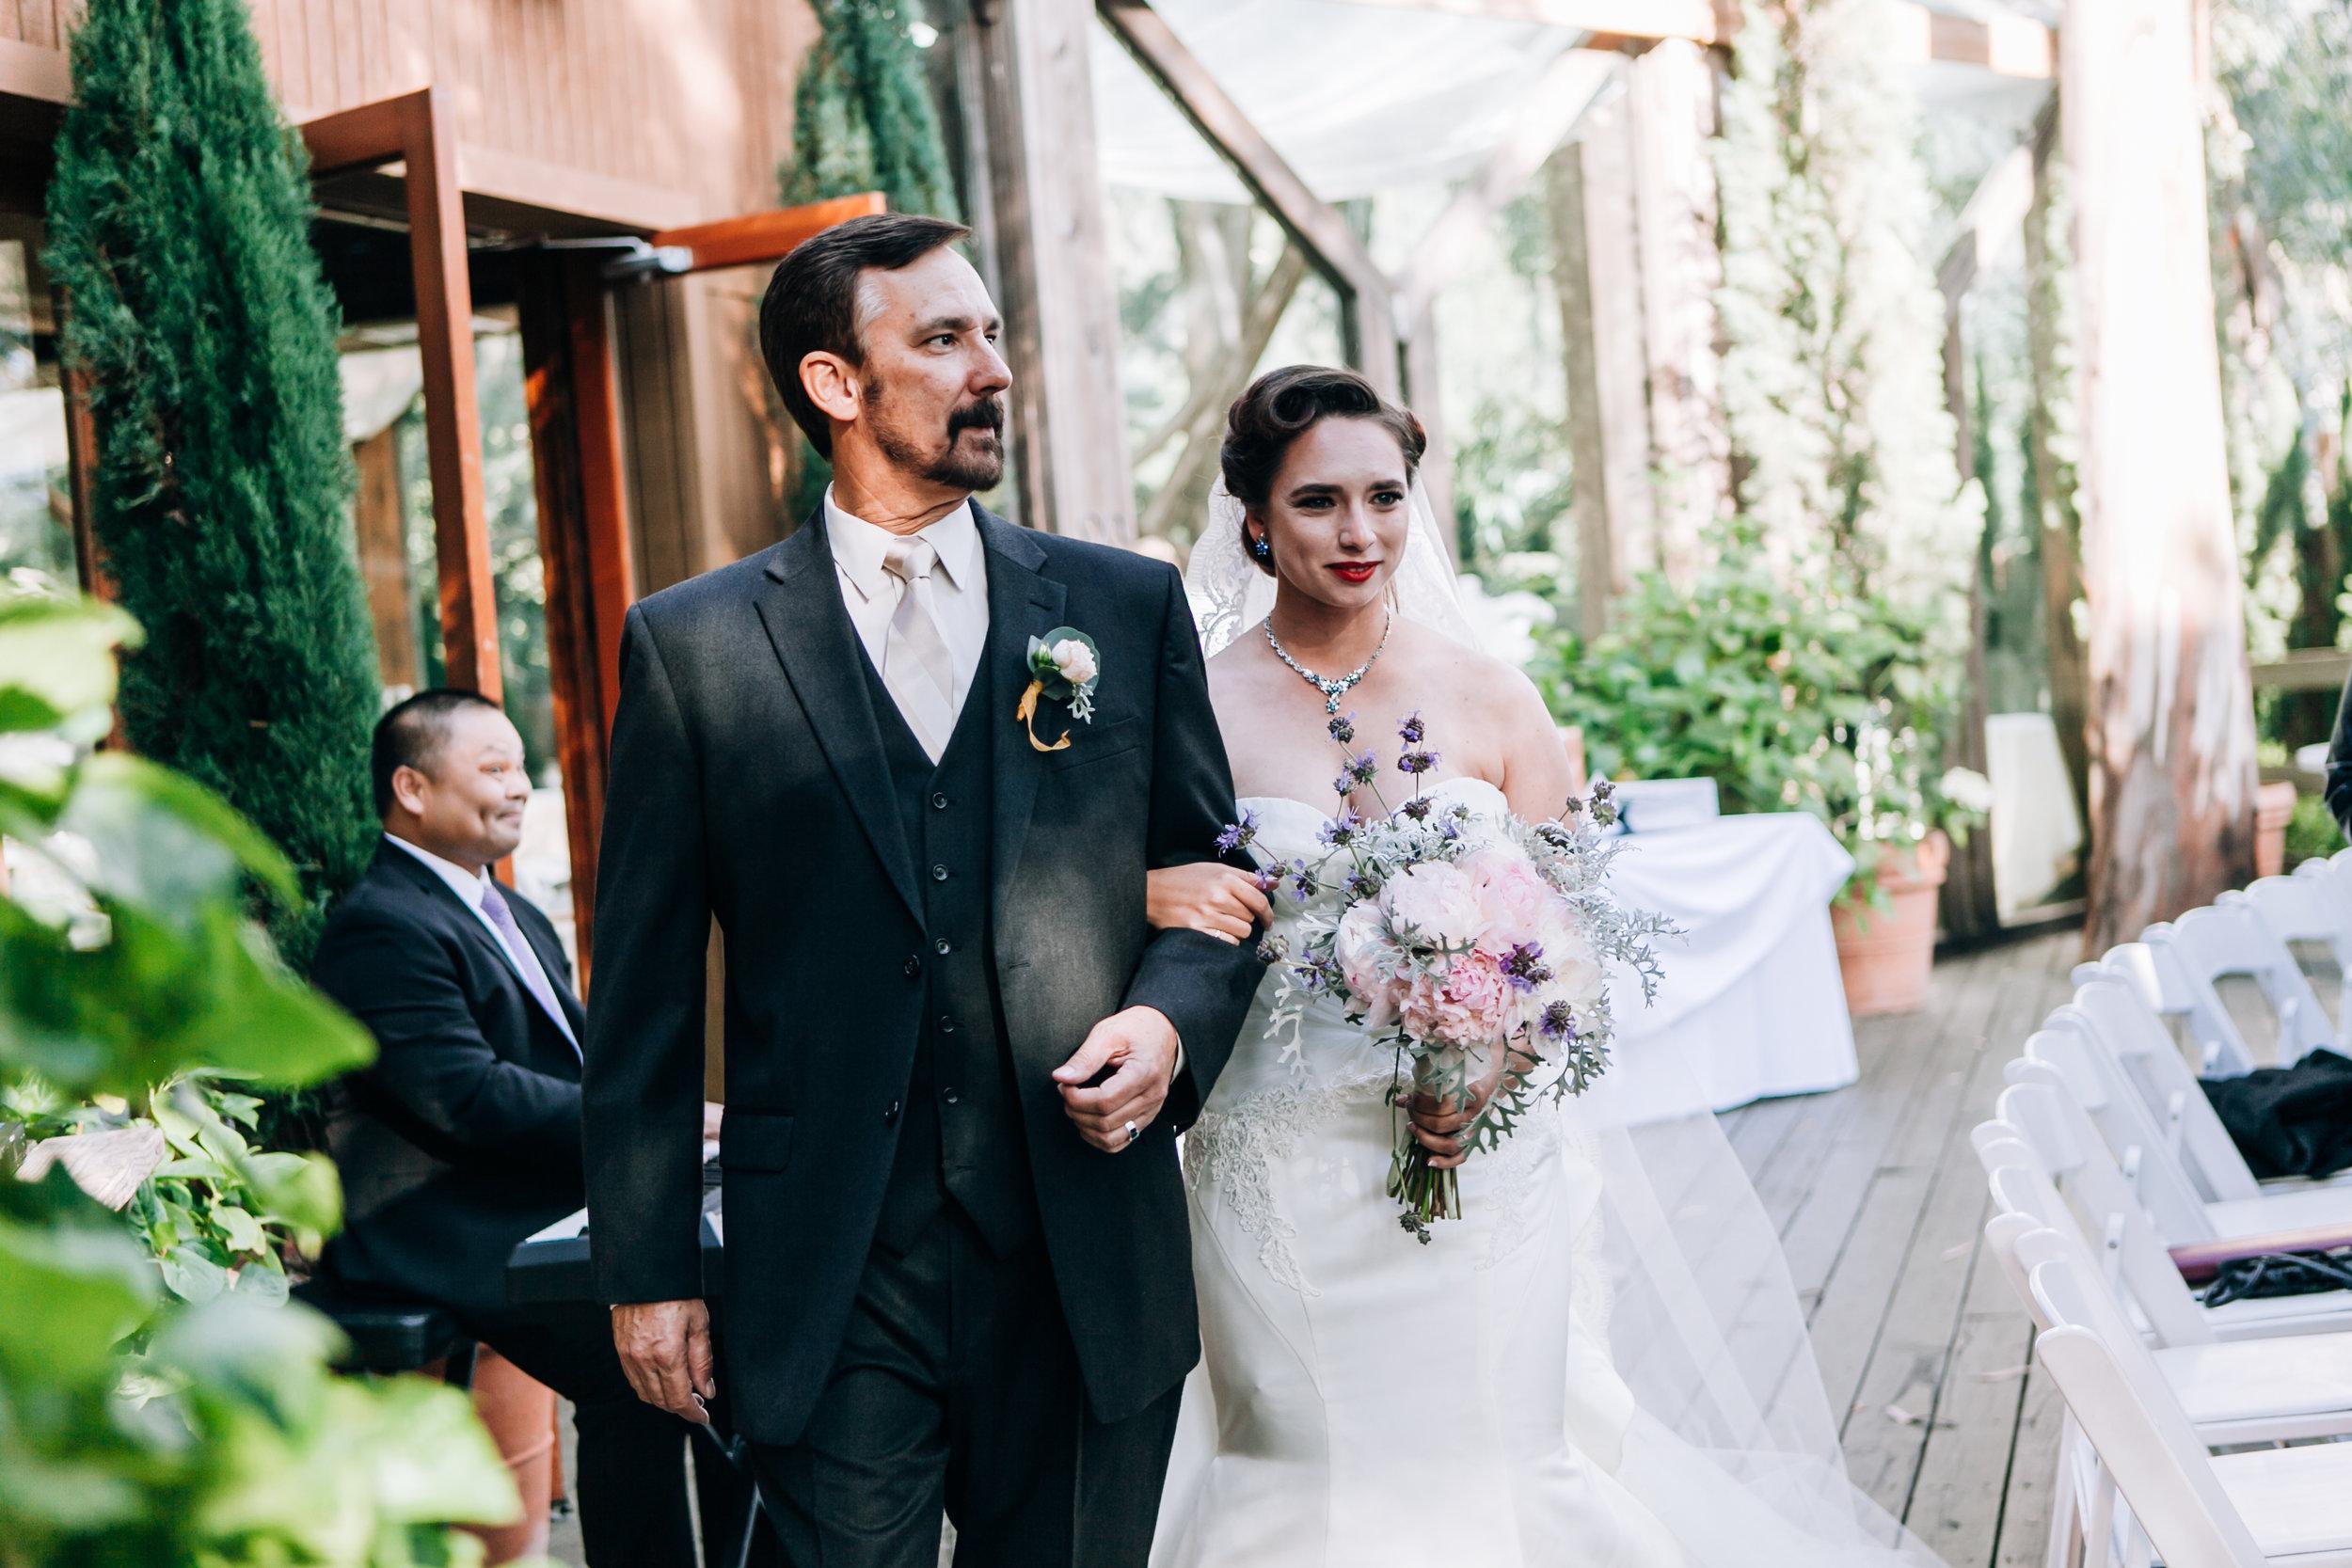 KaraNixonWeddings-Malibu-Wedding-34.jpg